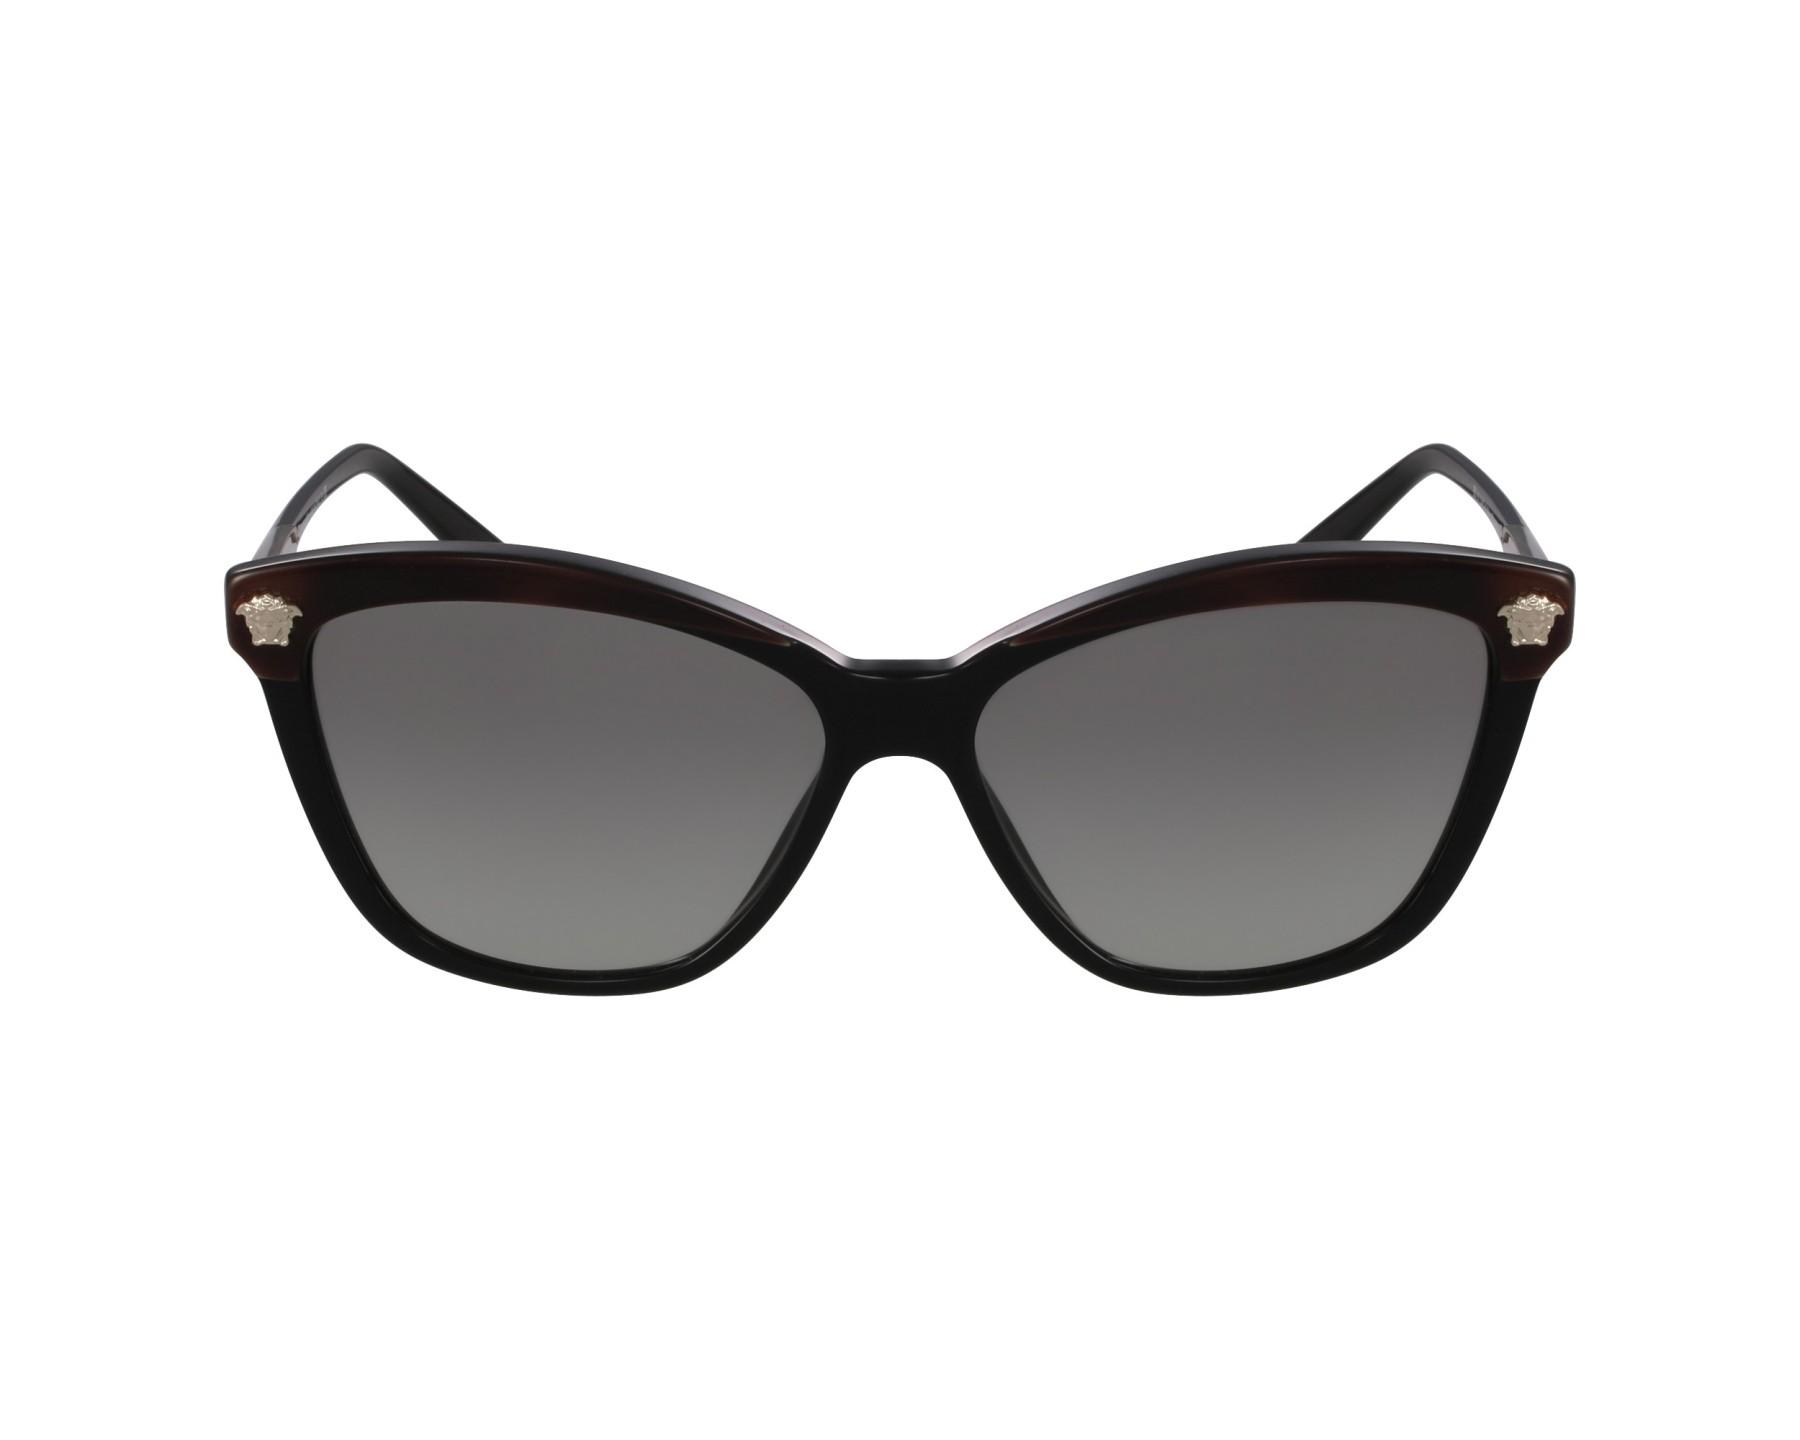 lunettes de soleil versace ve 4313 5180 11 noir visionet. Black Bedroom Furniture Sets. Home Design Ideas